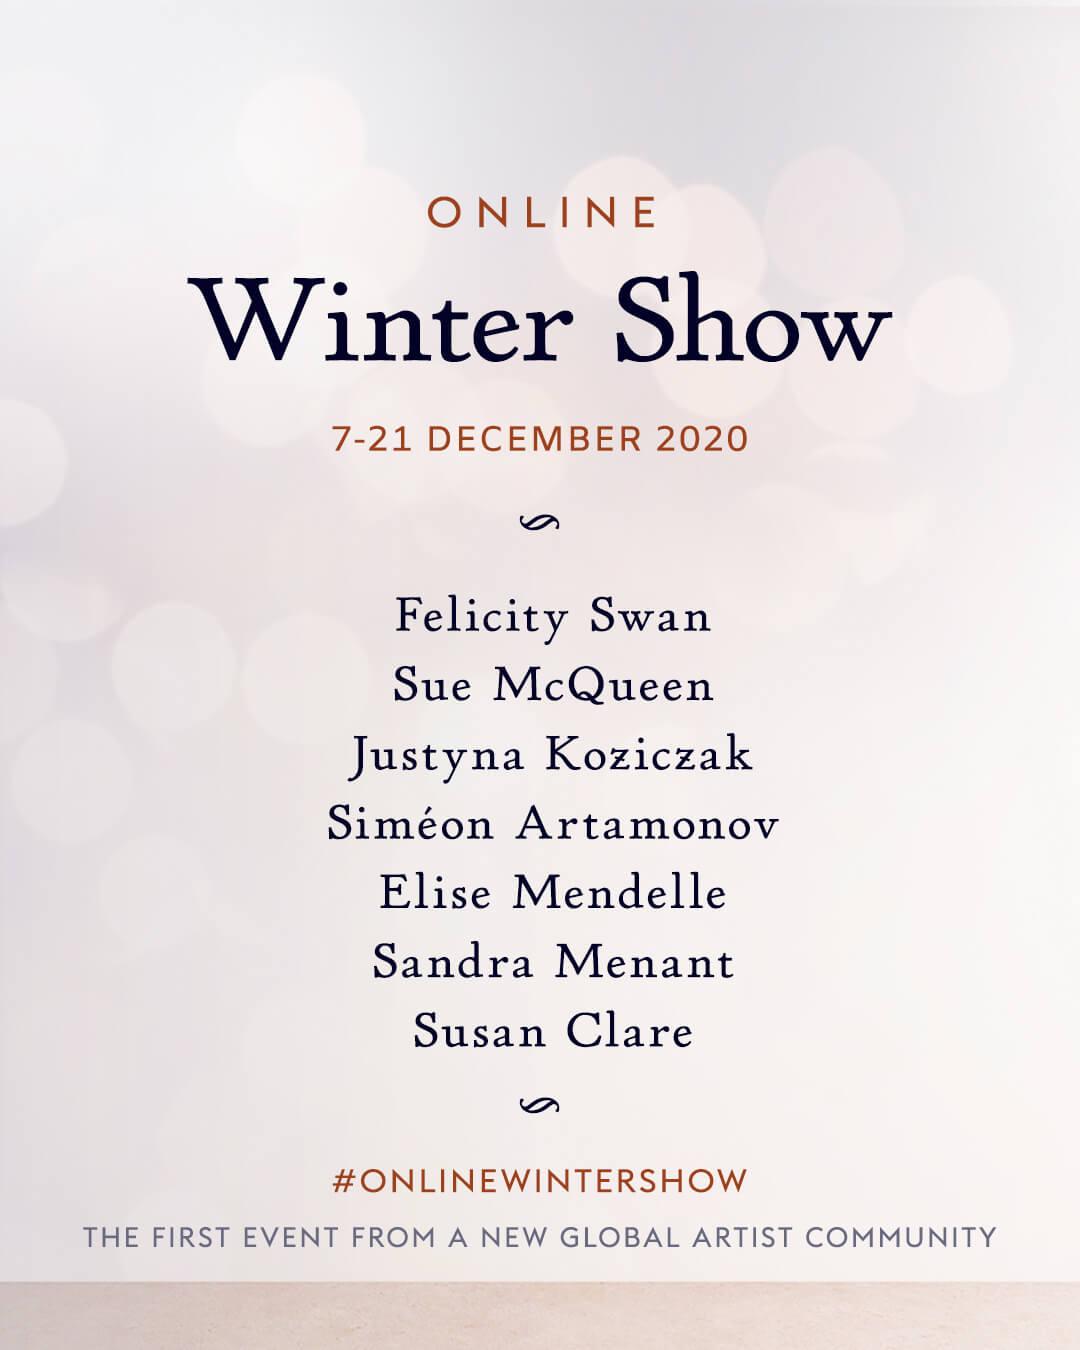 Online Winter Show